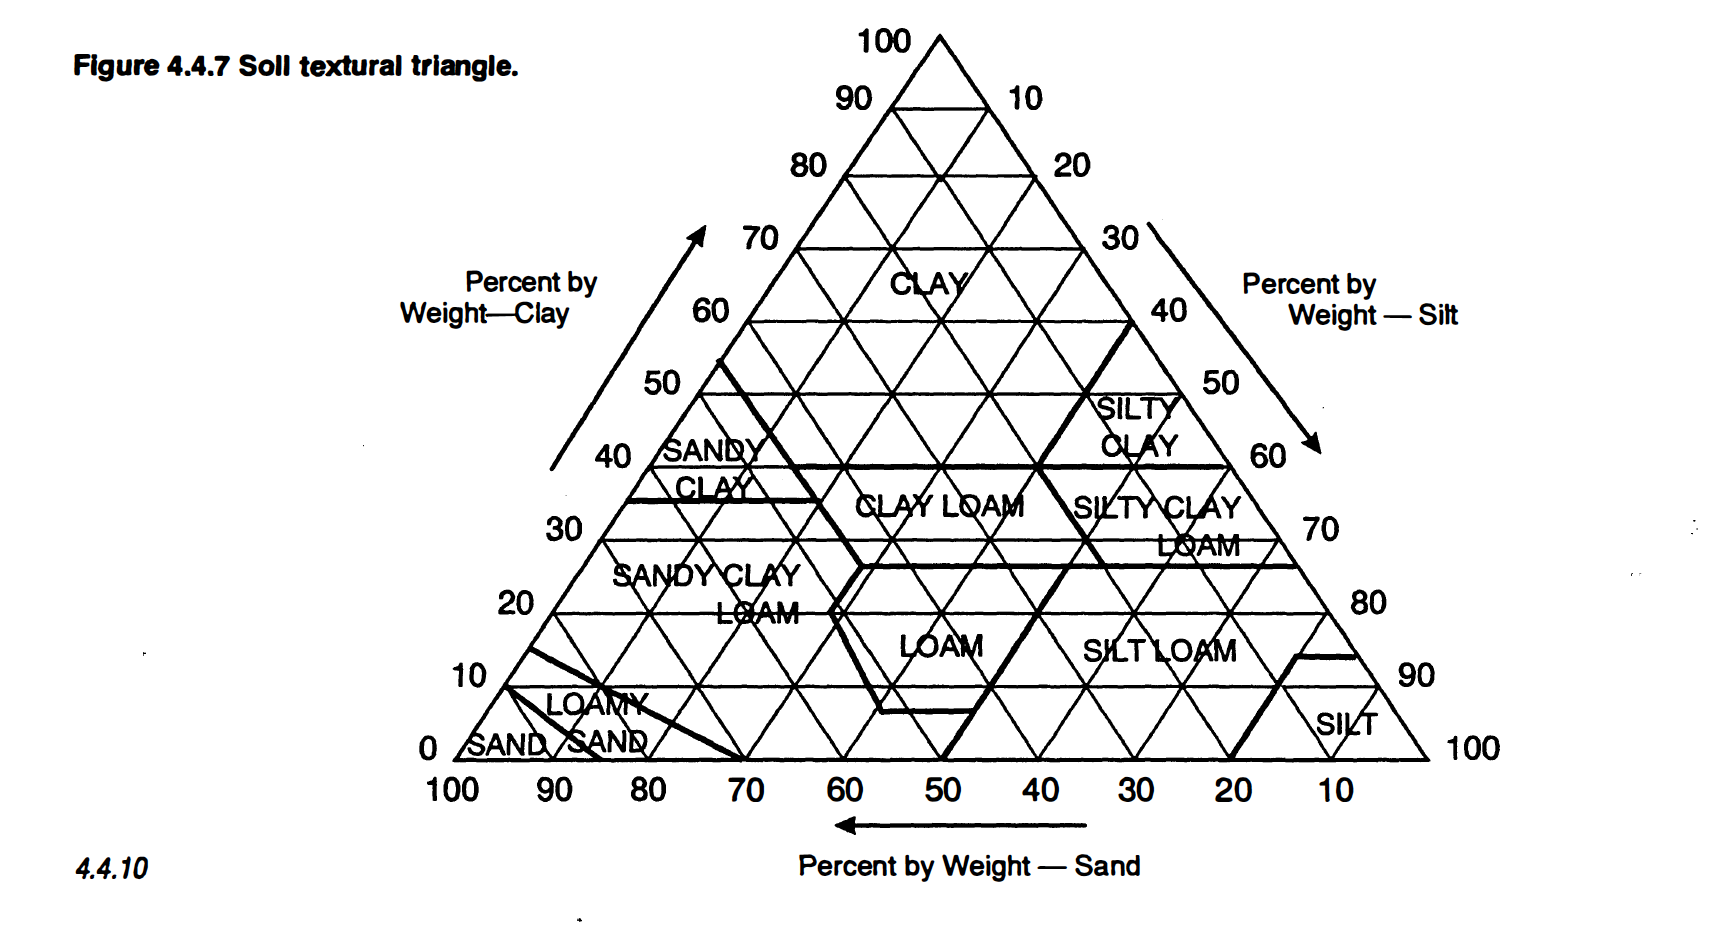 Soil textural triangle.